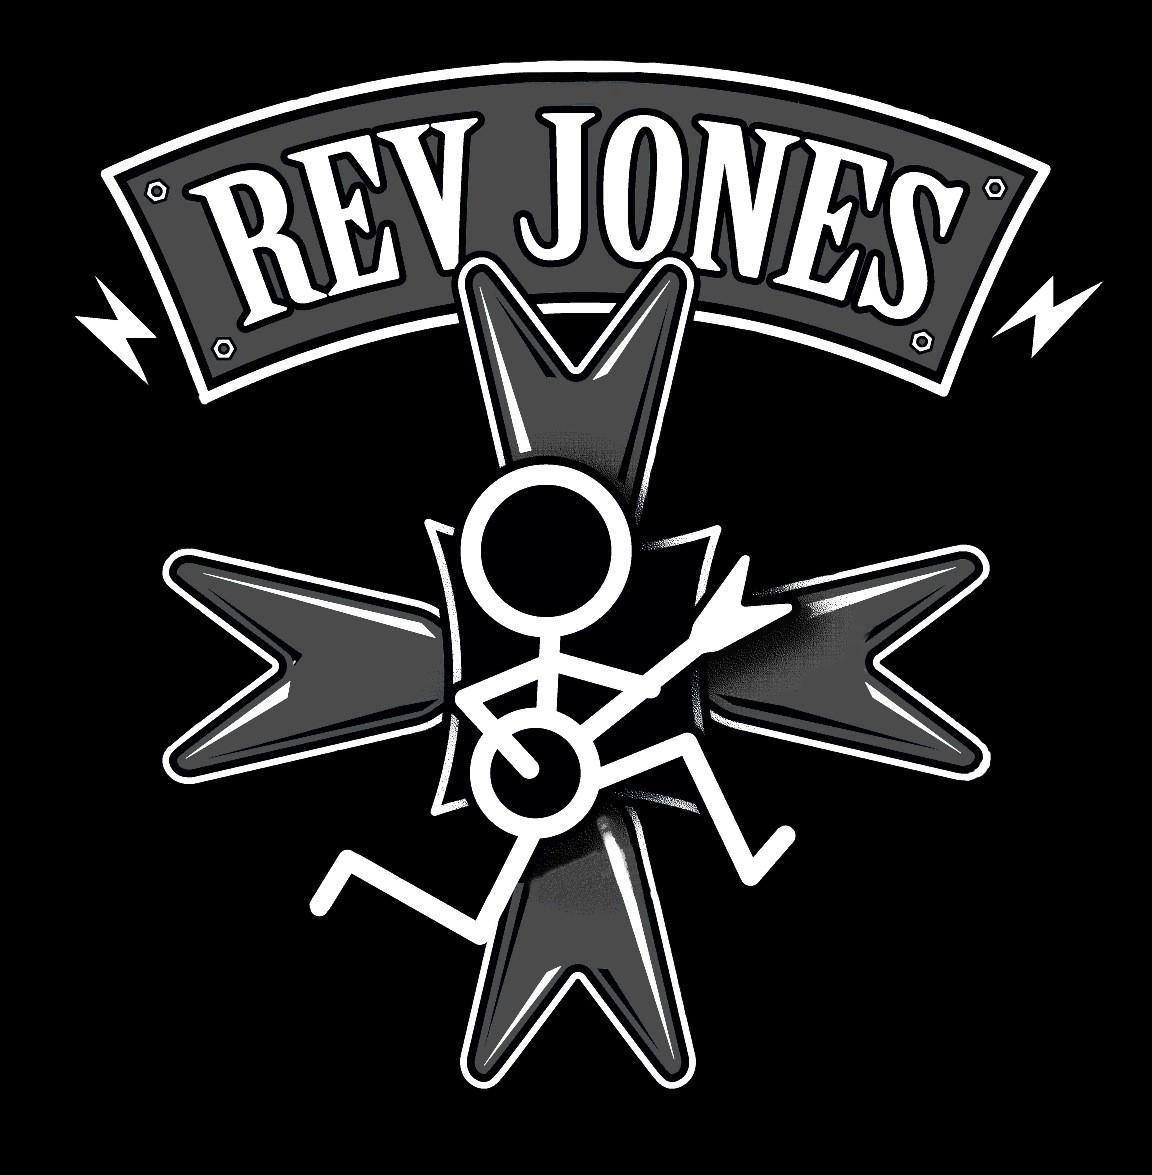 Rev Jones Metallica Is The One That Should Be Blamed